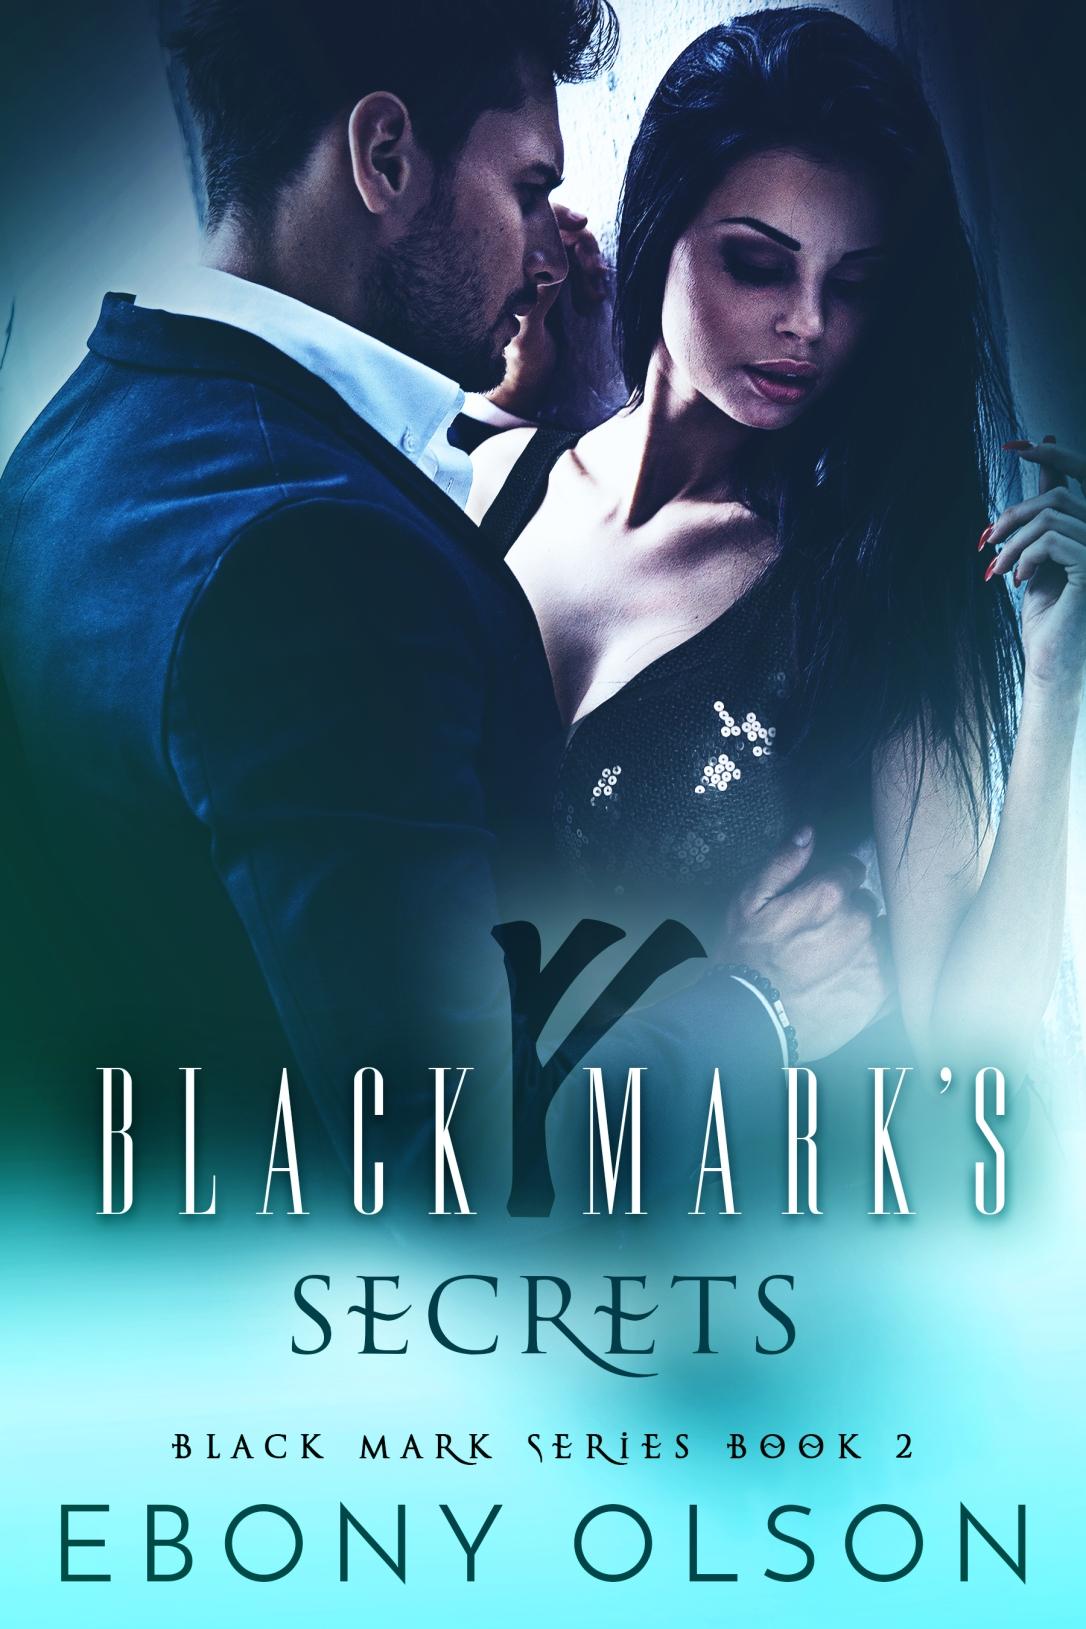 BlackMarksSecrets